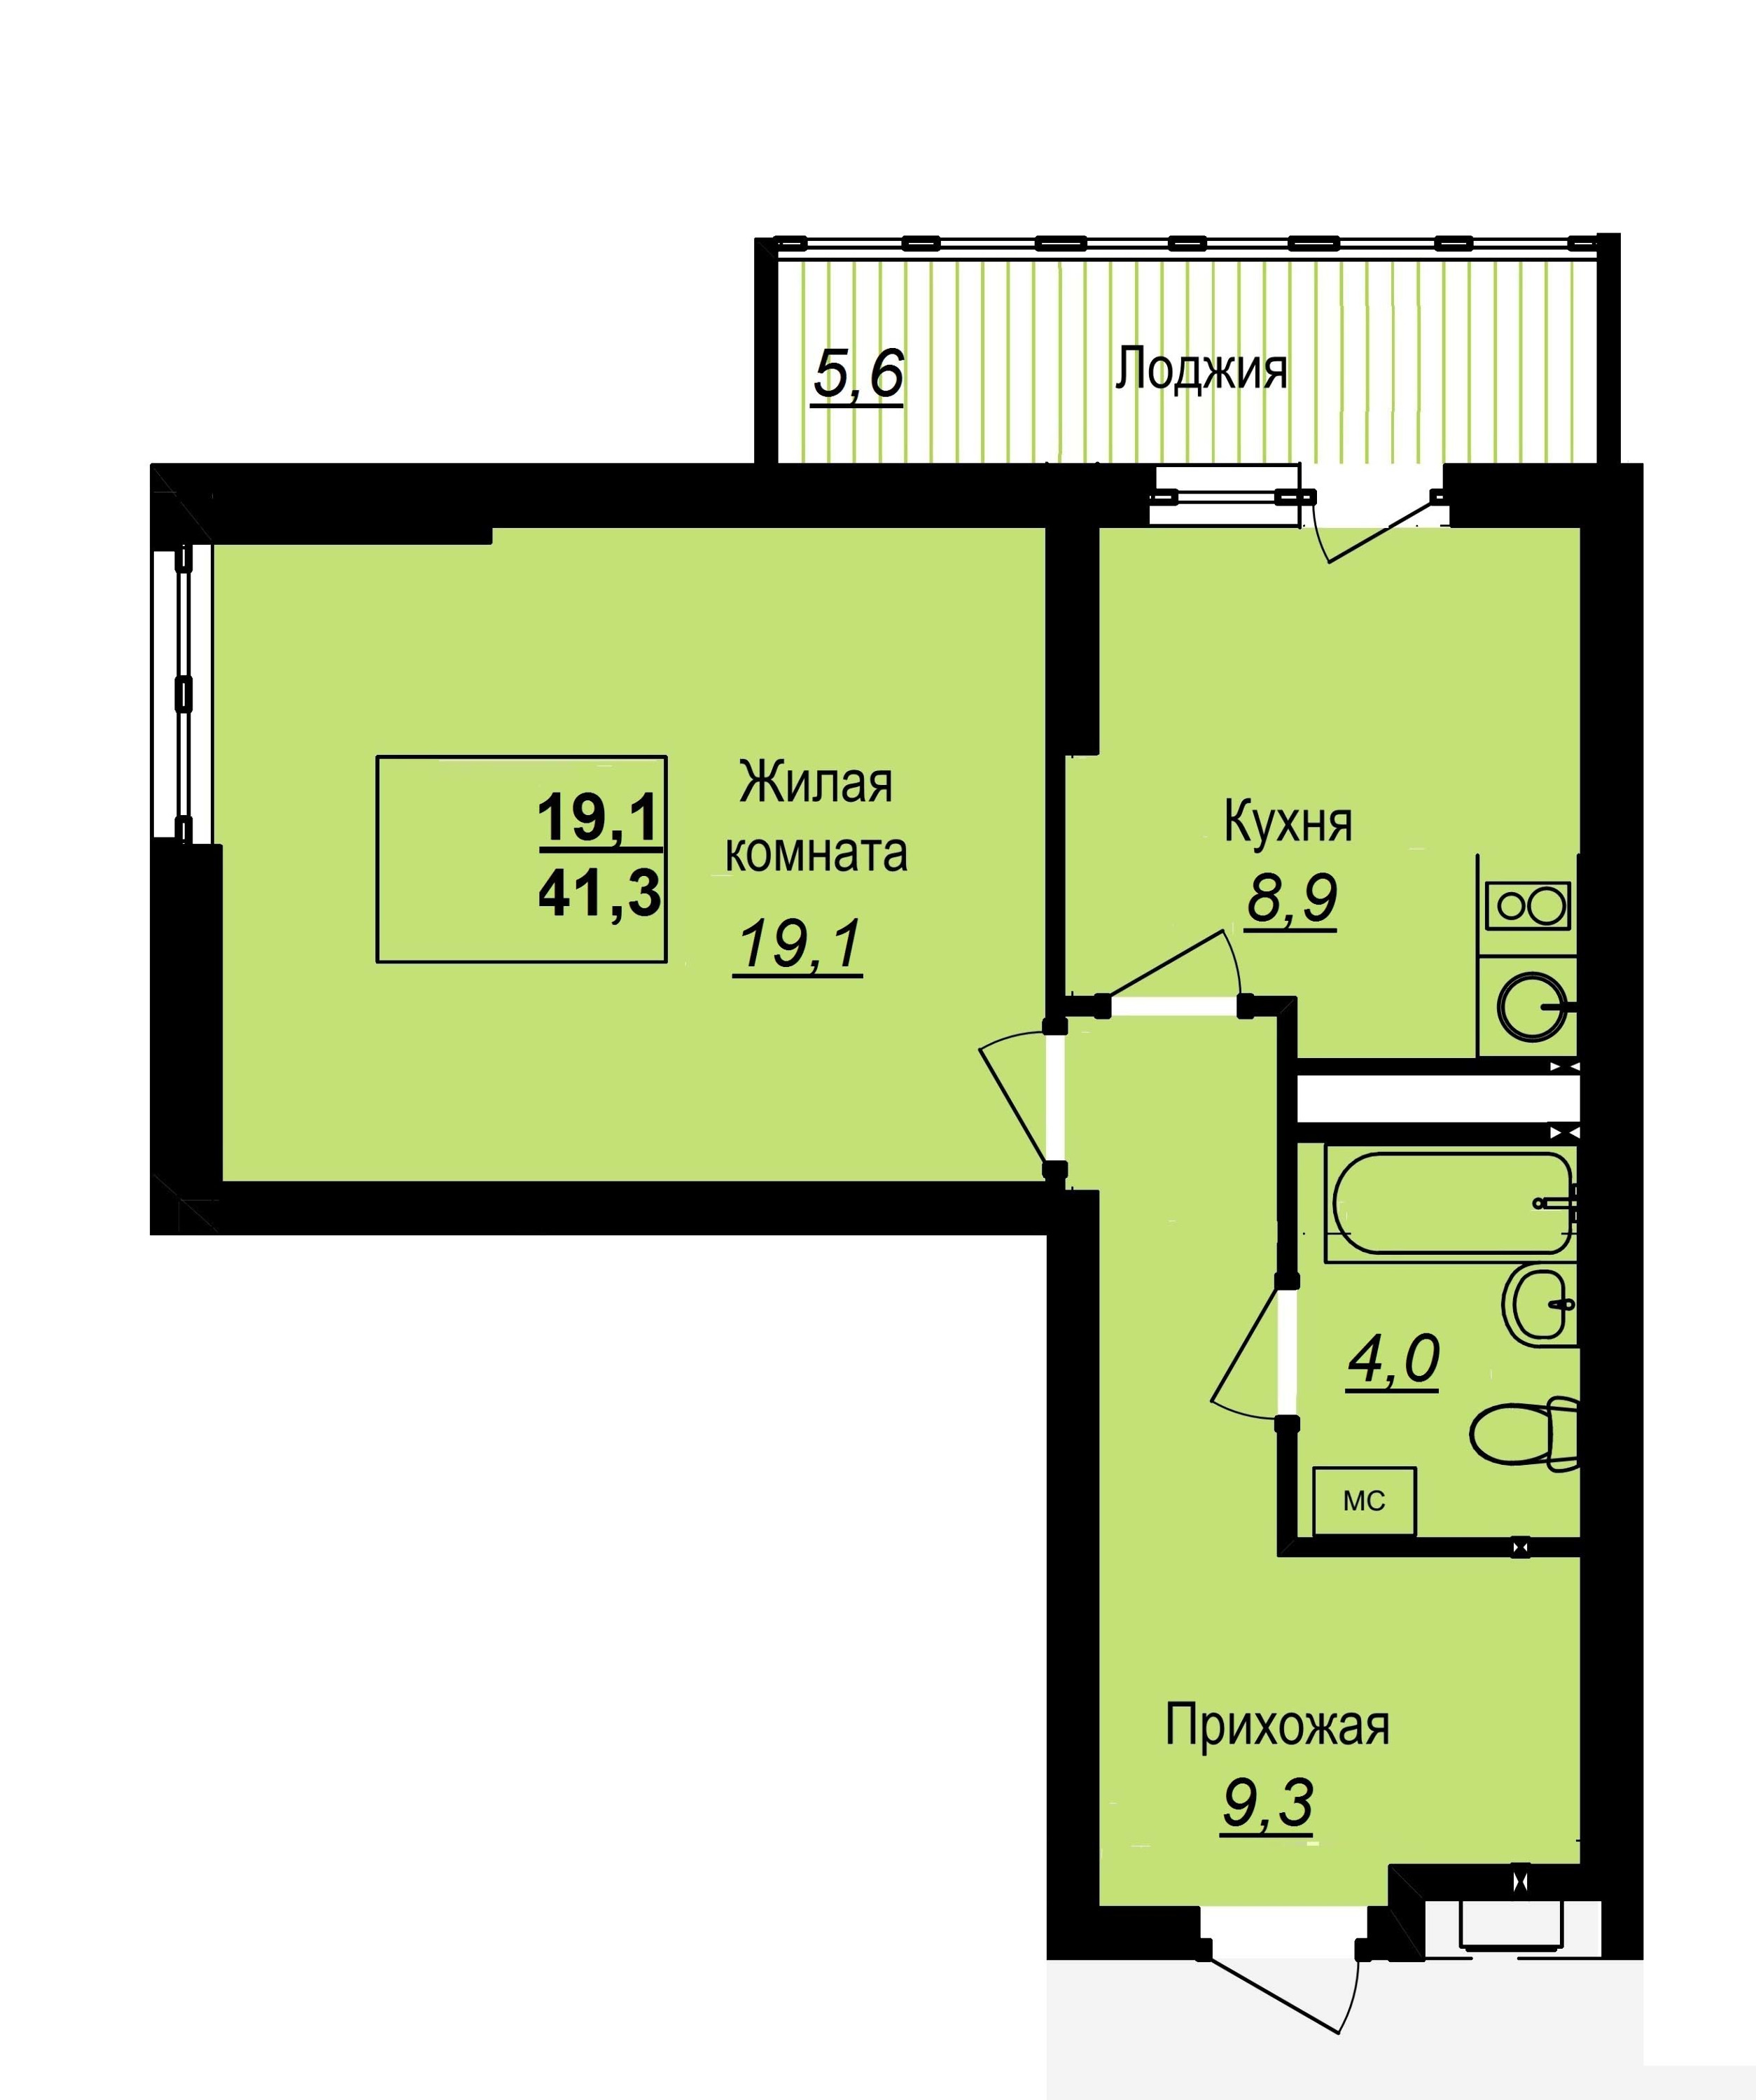 Однокомнатная квартира площадью 41 кв. м, цена&nbsp;— от 2,6 млн рублей<br> <!--[if !supportLineBreakNewLine]--><br> <!--[endif]-->